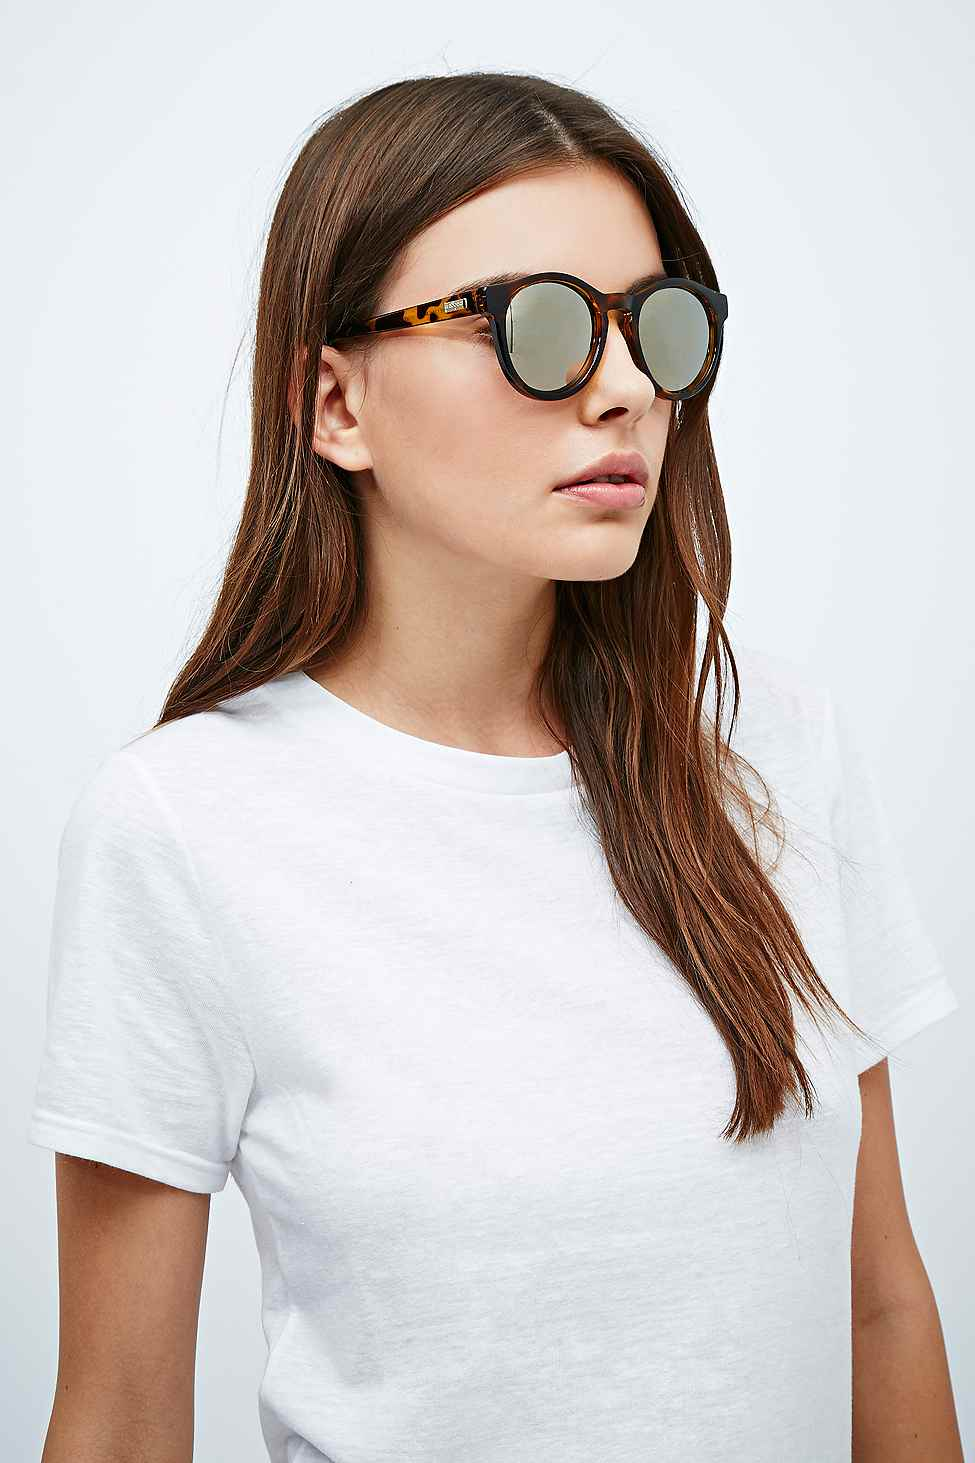 e19f6b0e59cf Le Specs Hey Macarena Mirror Lens Sunglasses In Tortoiseshell in ...